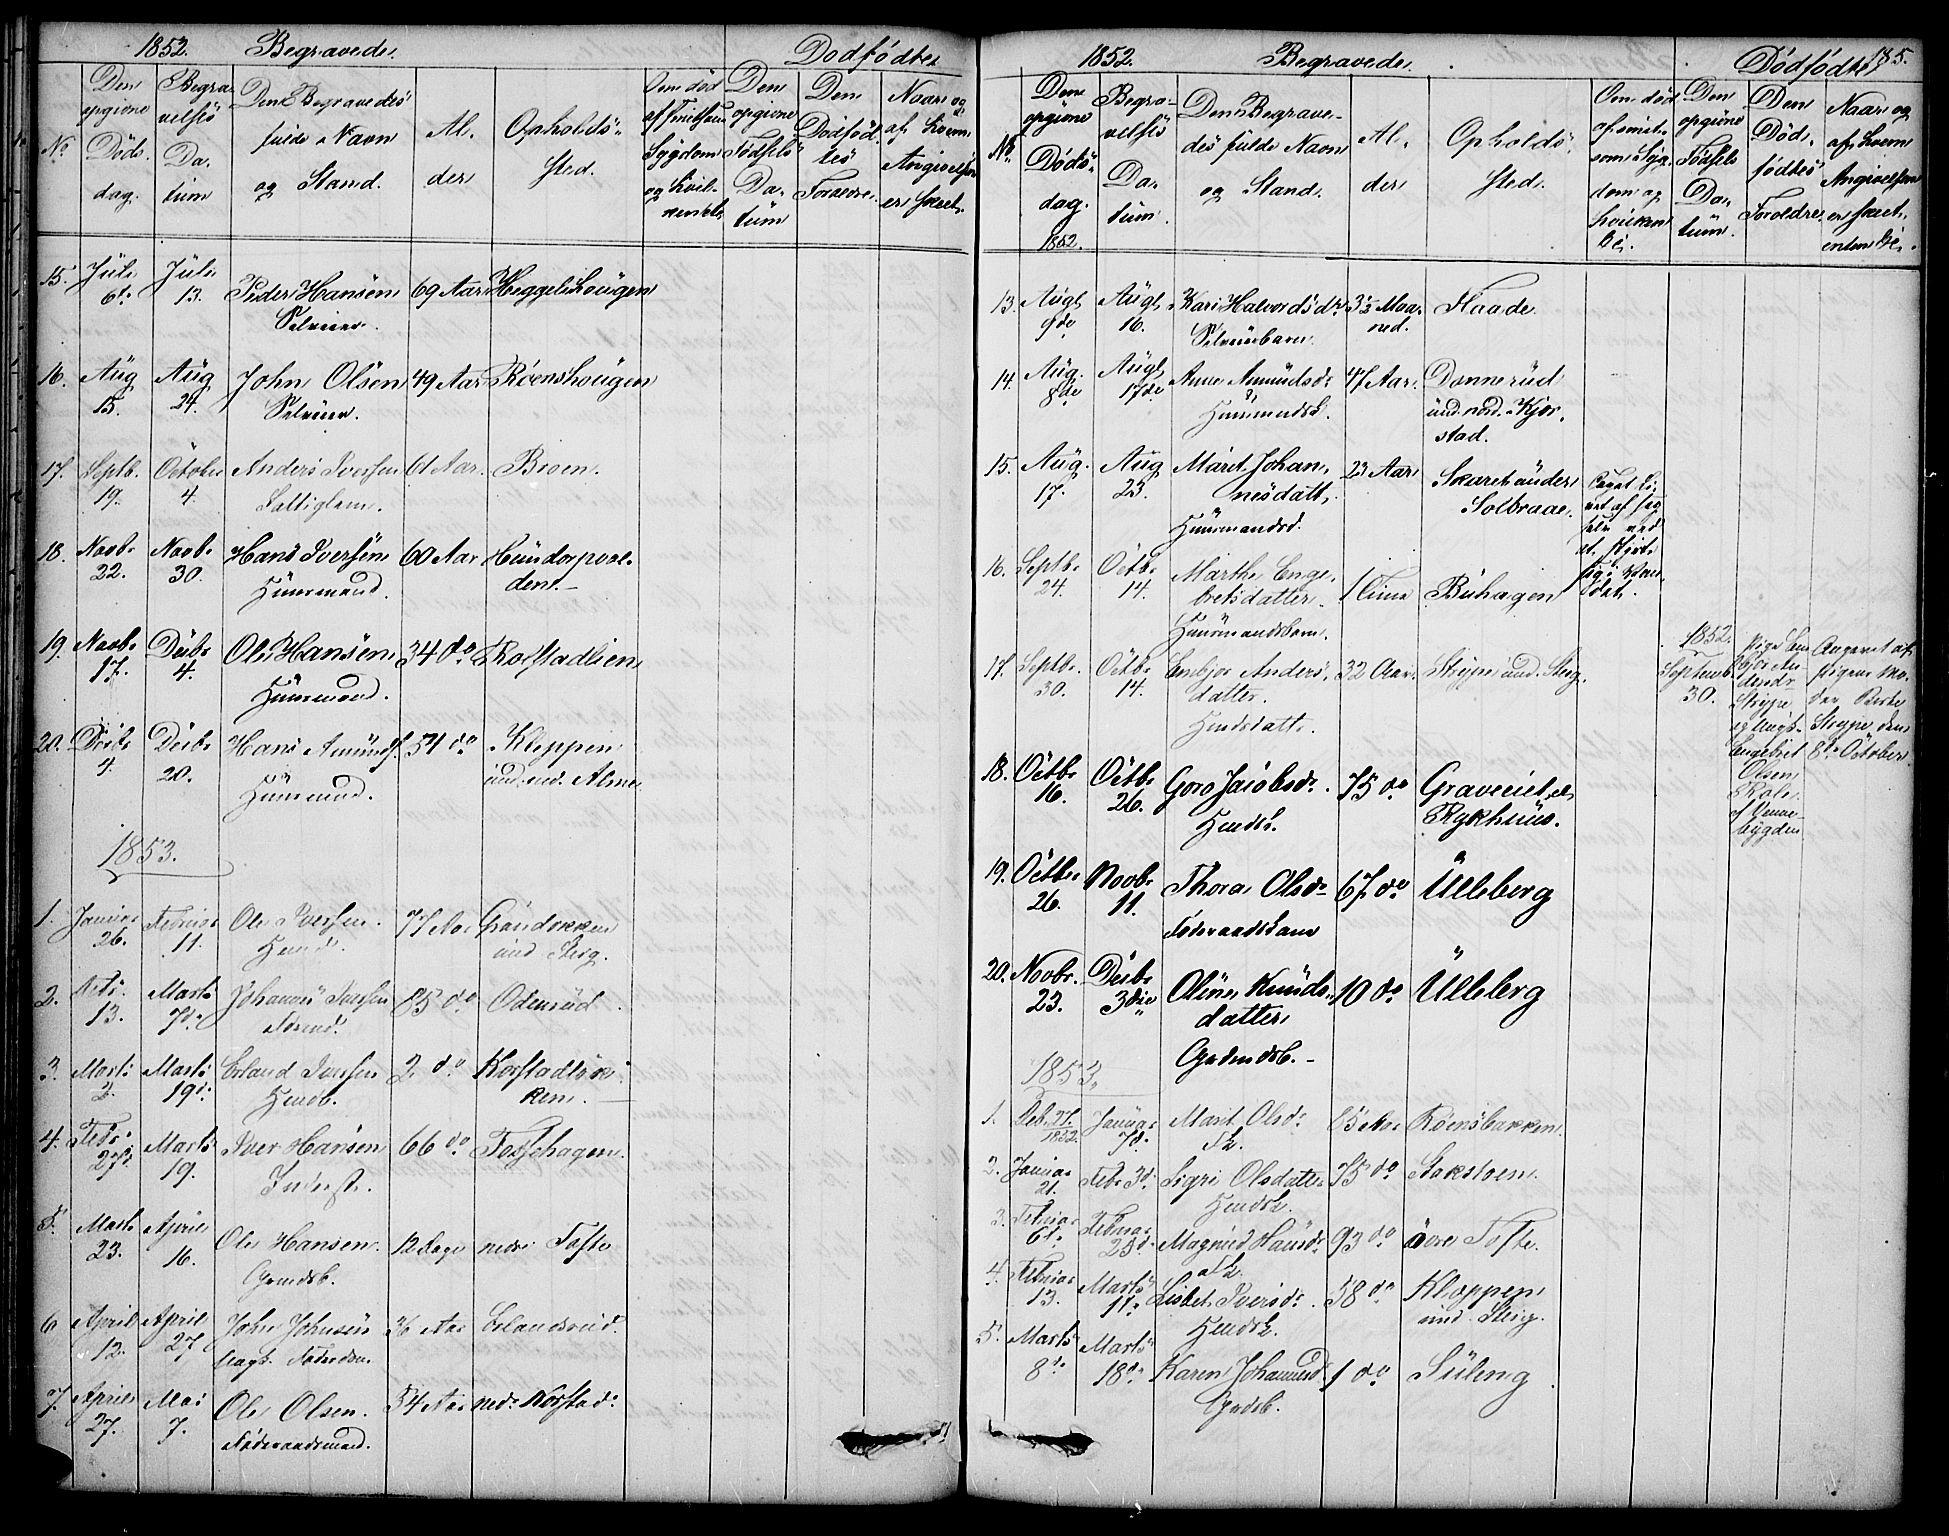 SAH, Sør-Fron prestekontor, H/Ha/Hab/L0001: Klokkerbok nr. 1, 1844-1863, s. 185